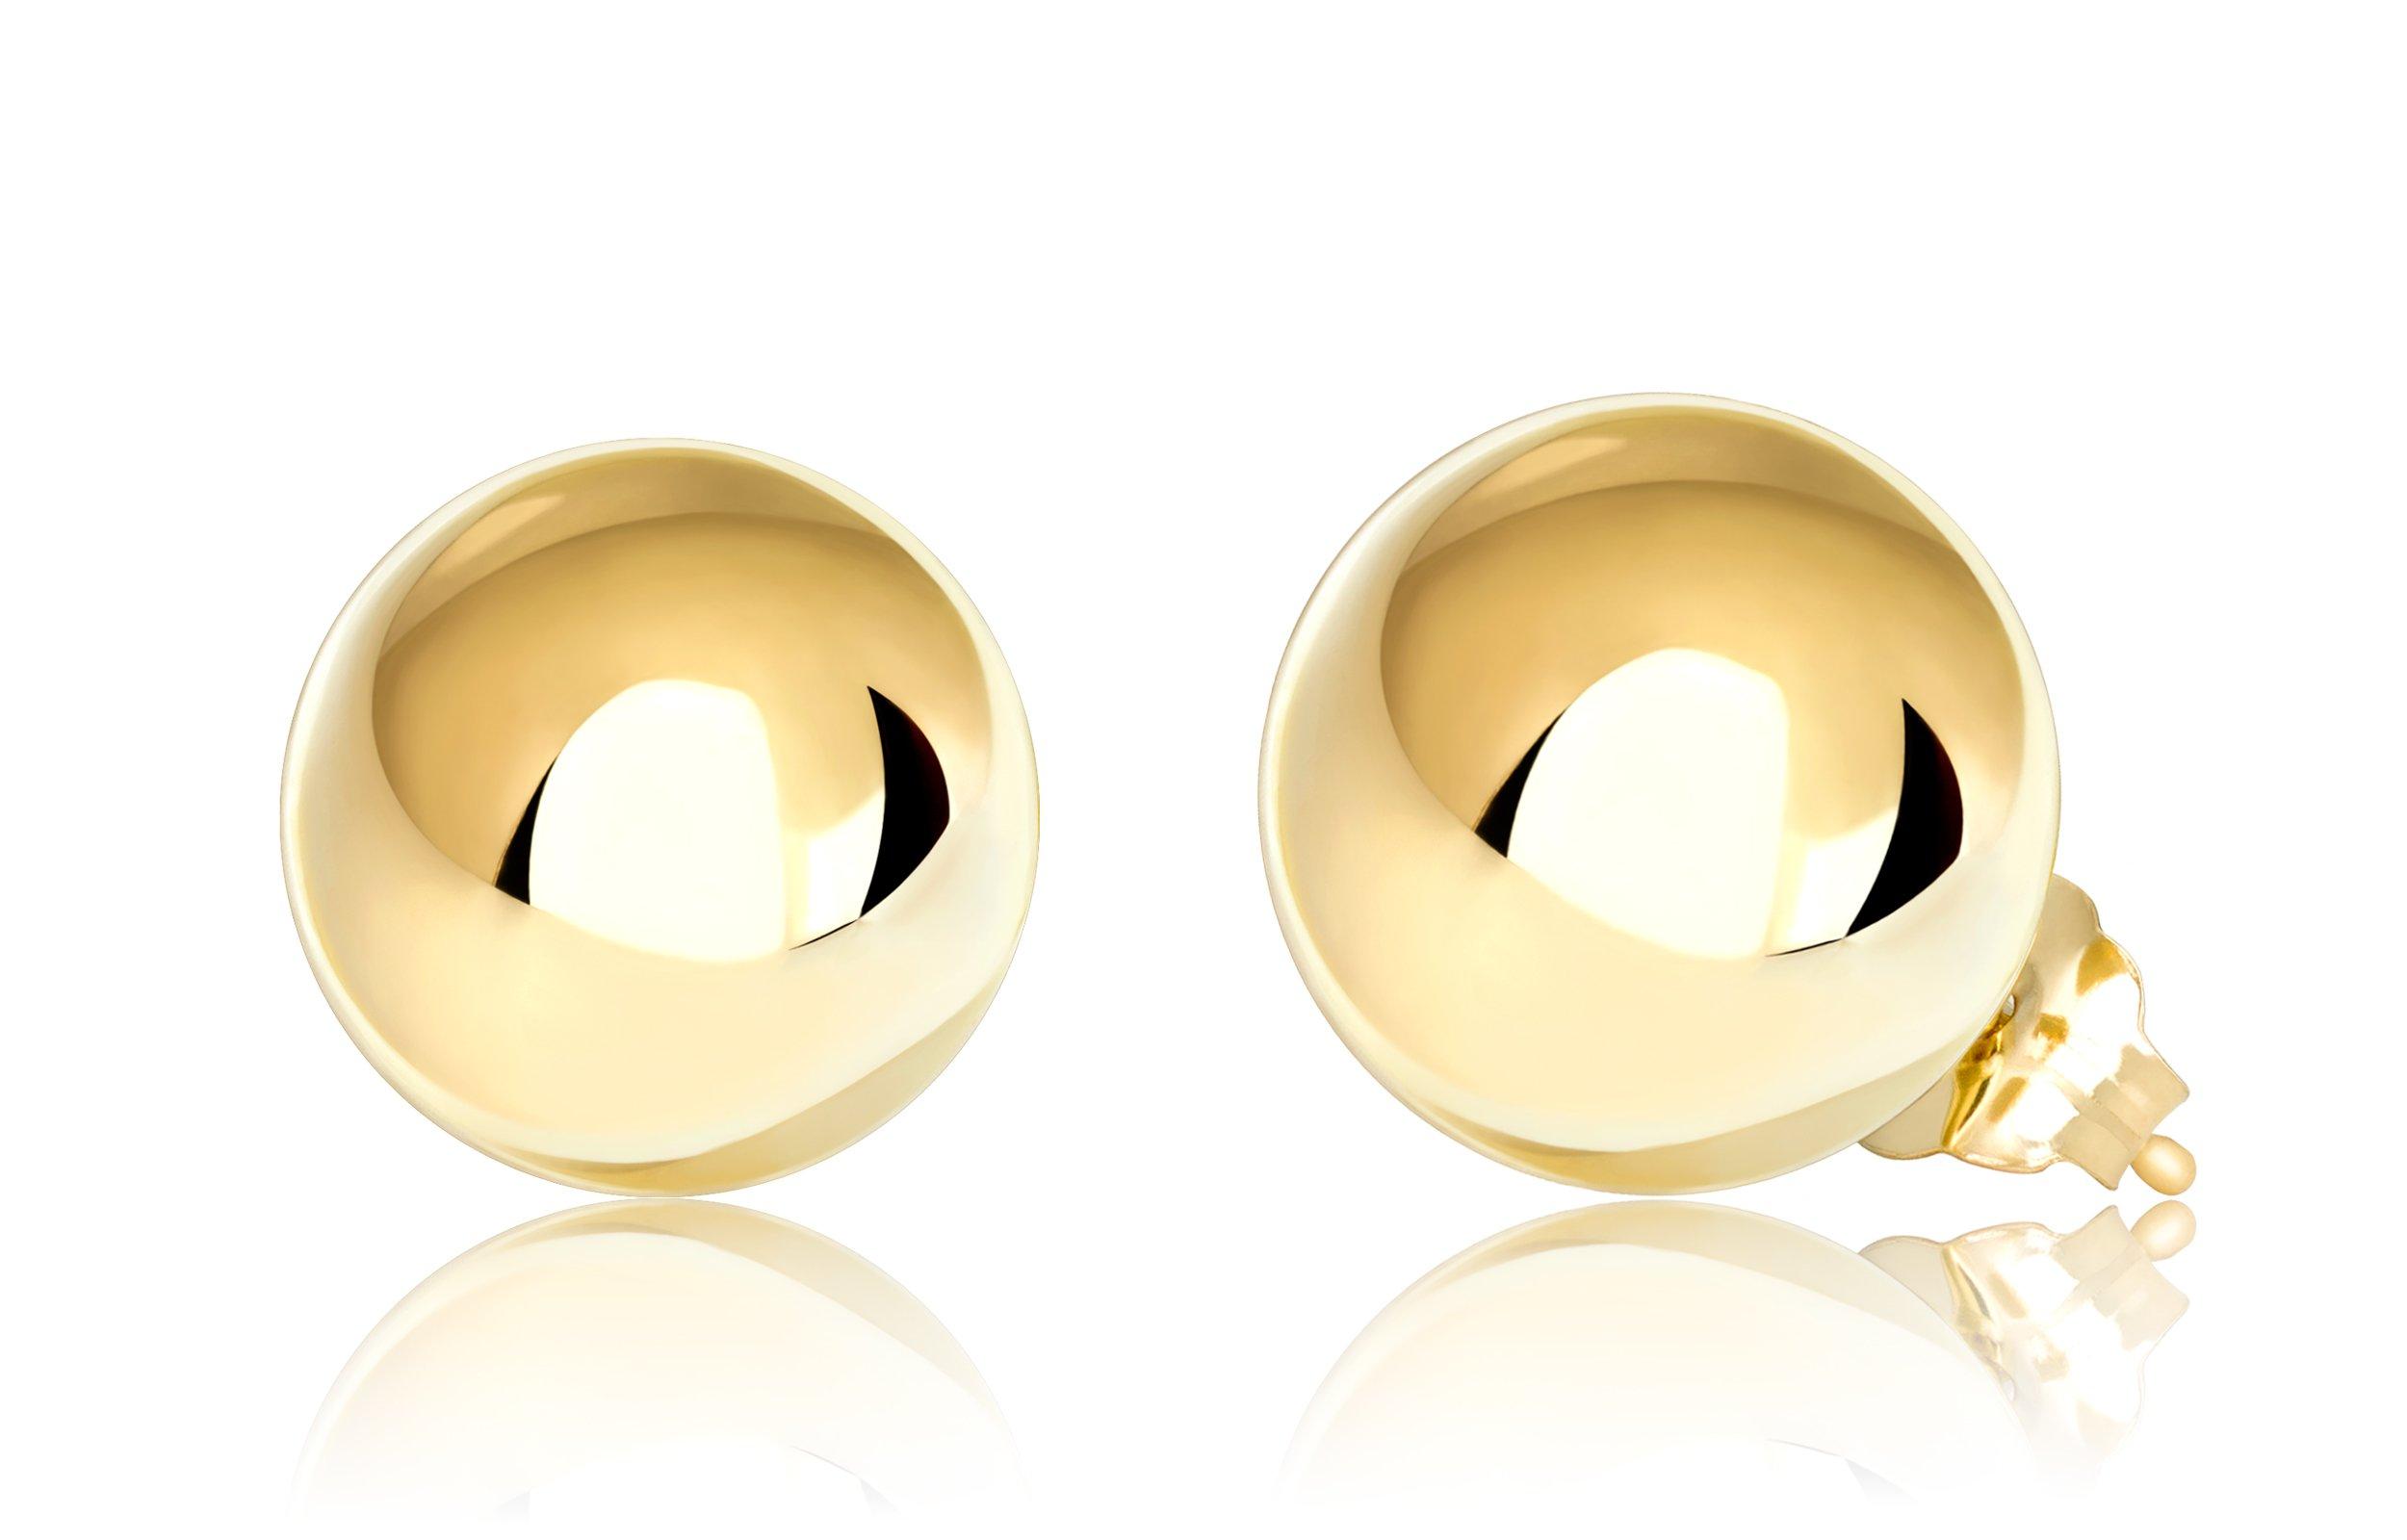 Premium 14K Yellow Gold Ball Stud Earrings (9mm - Yellow Gold)